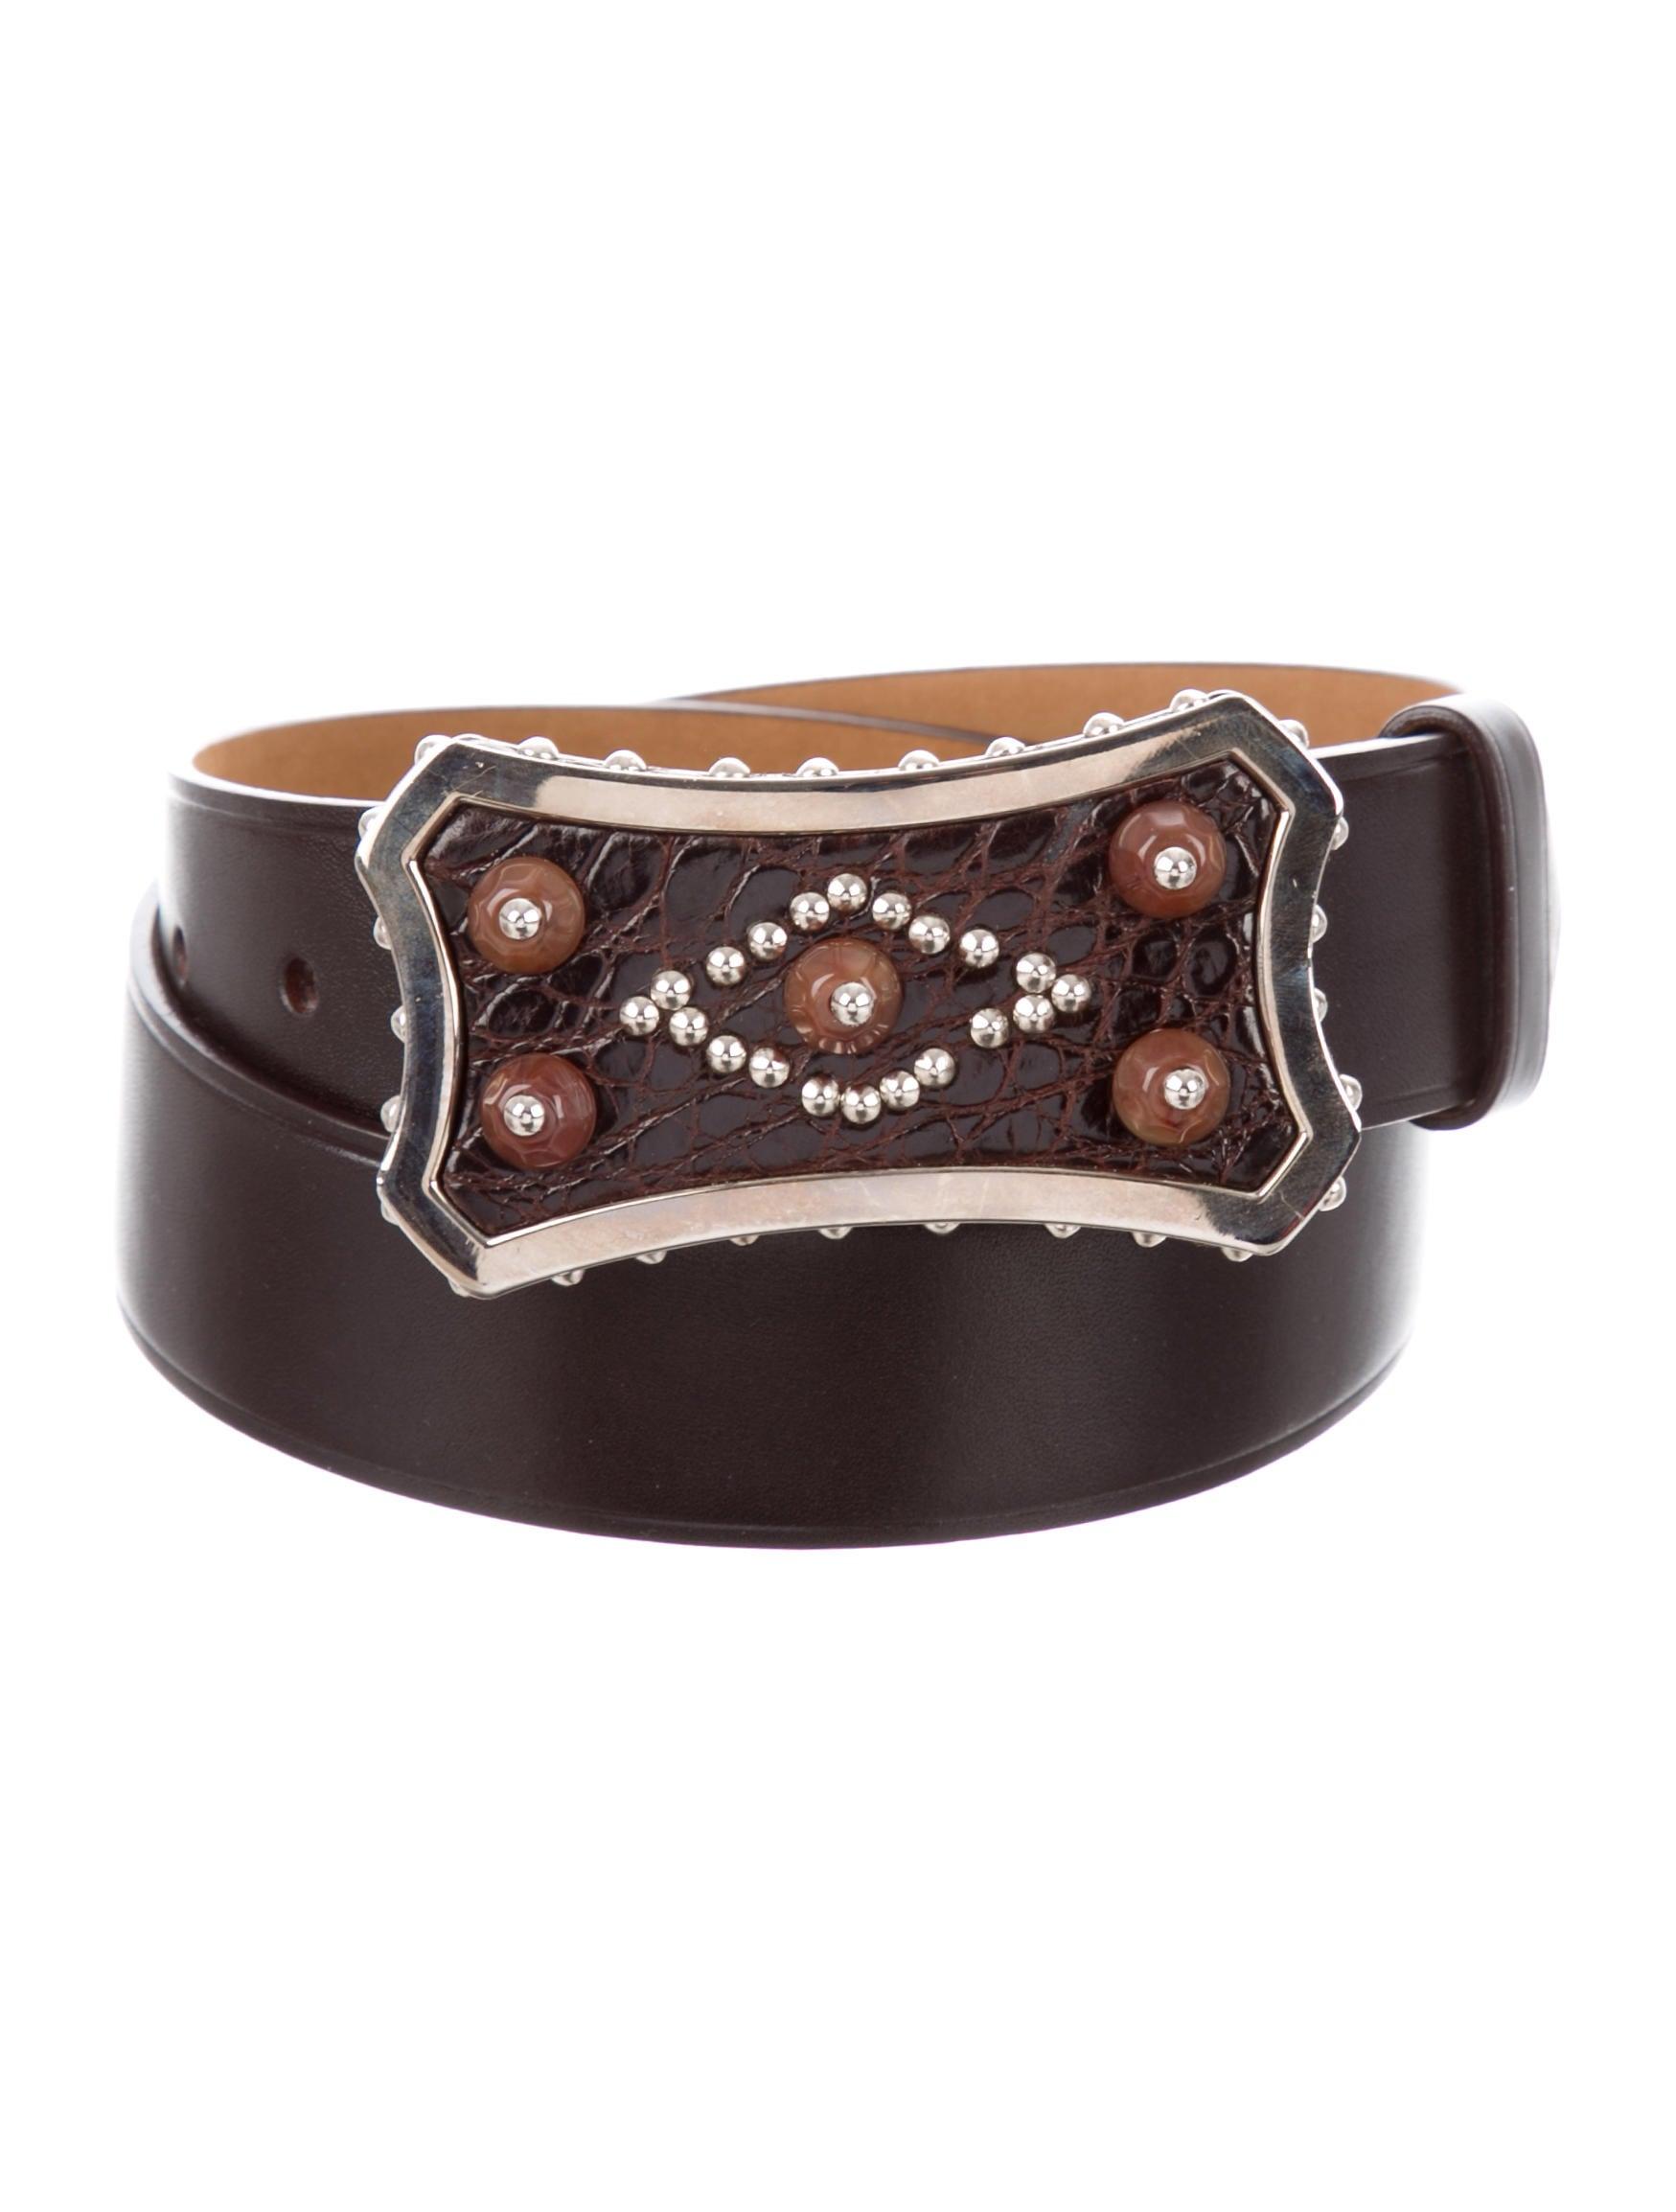 prada black leather belt accessories pra119796 the